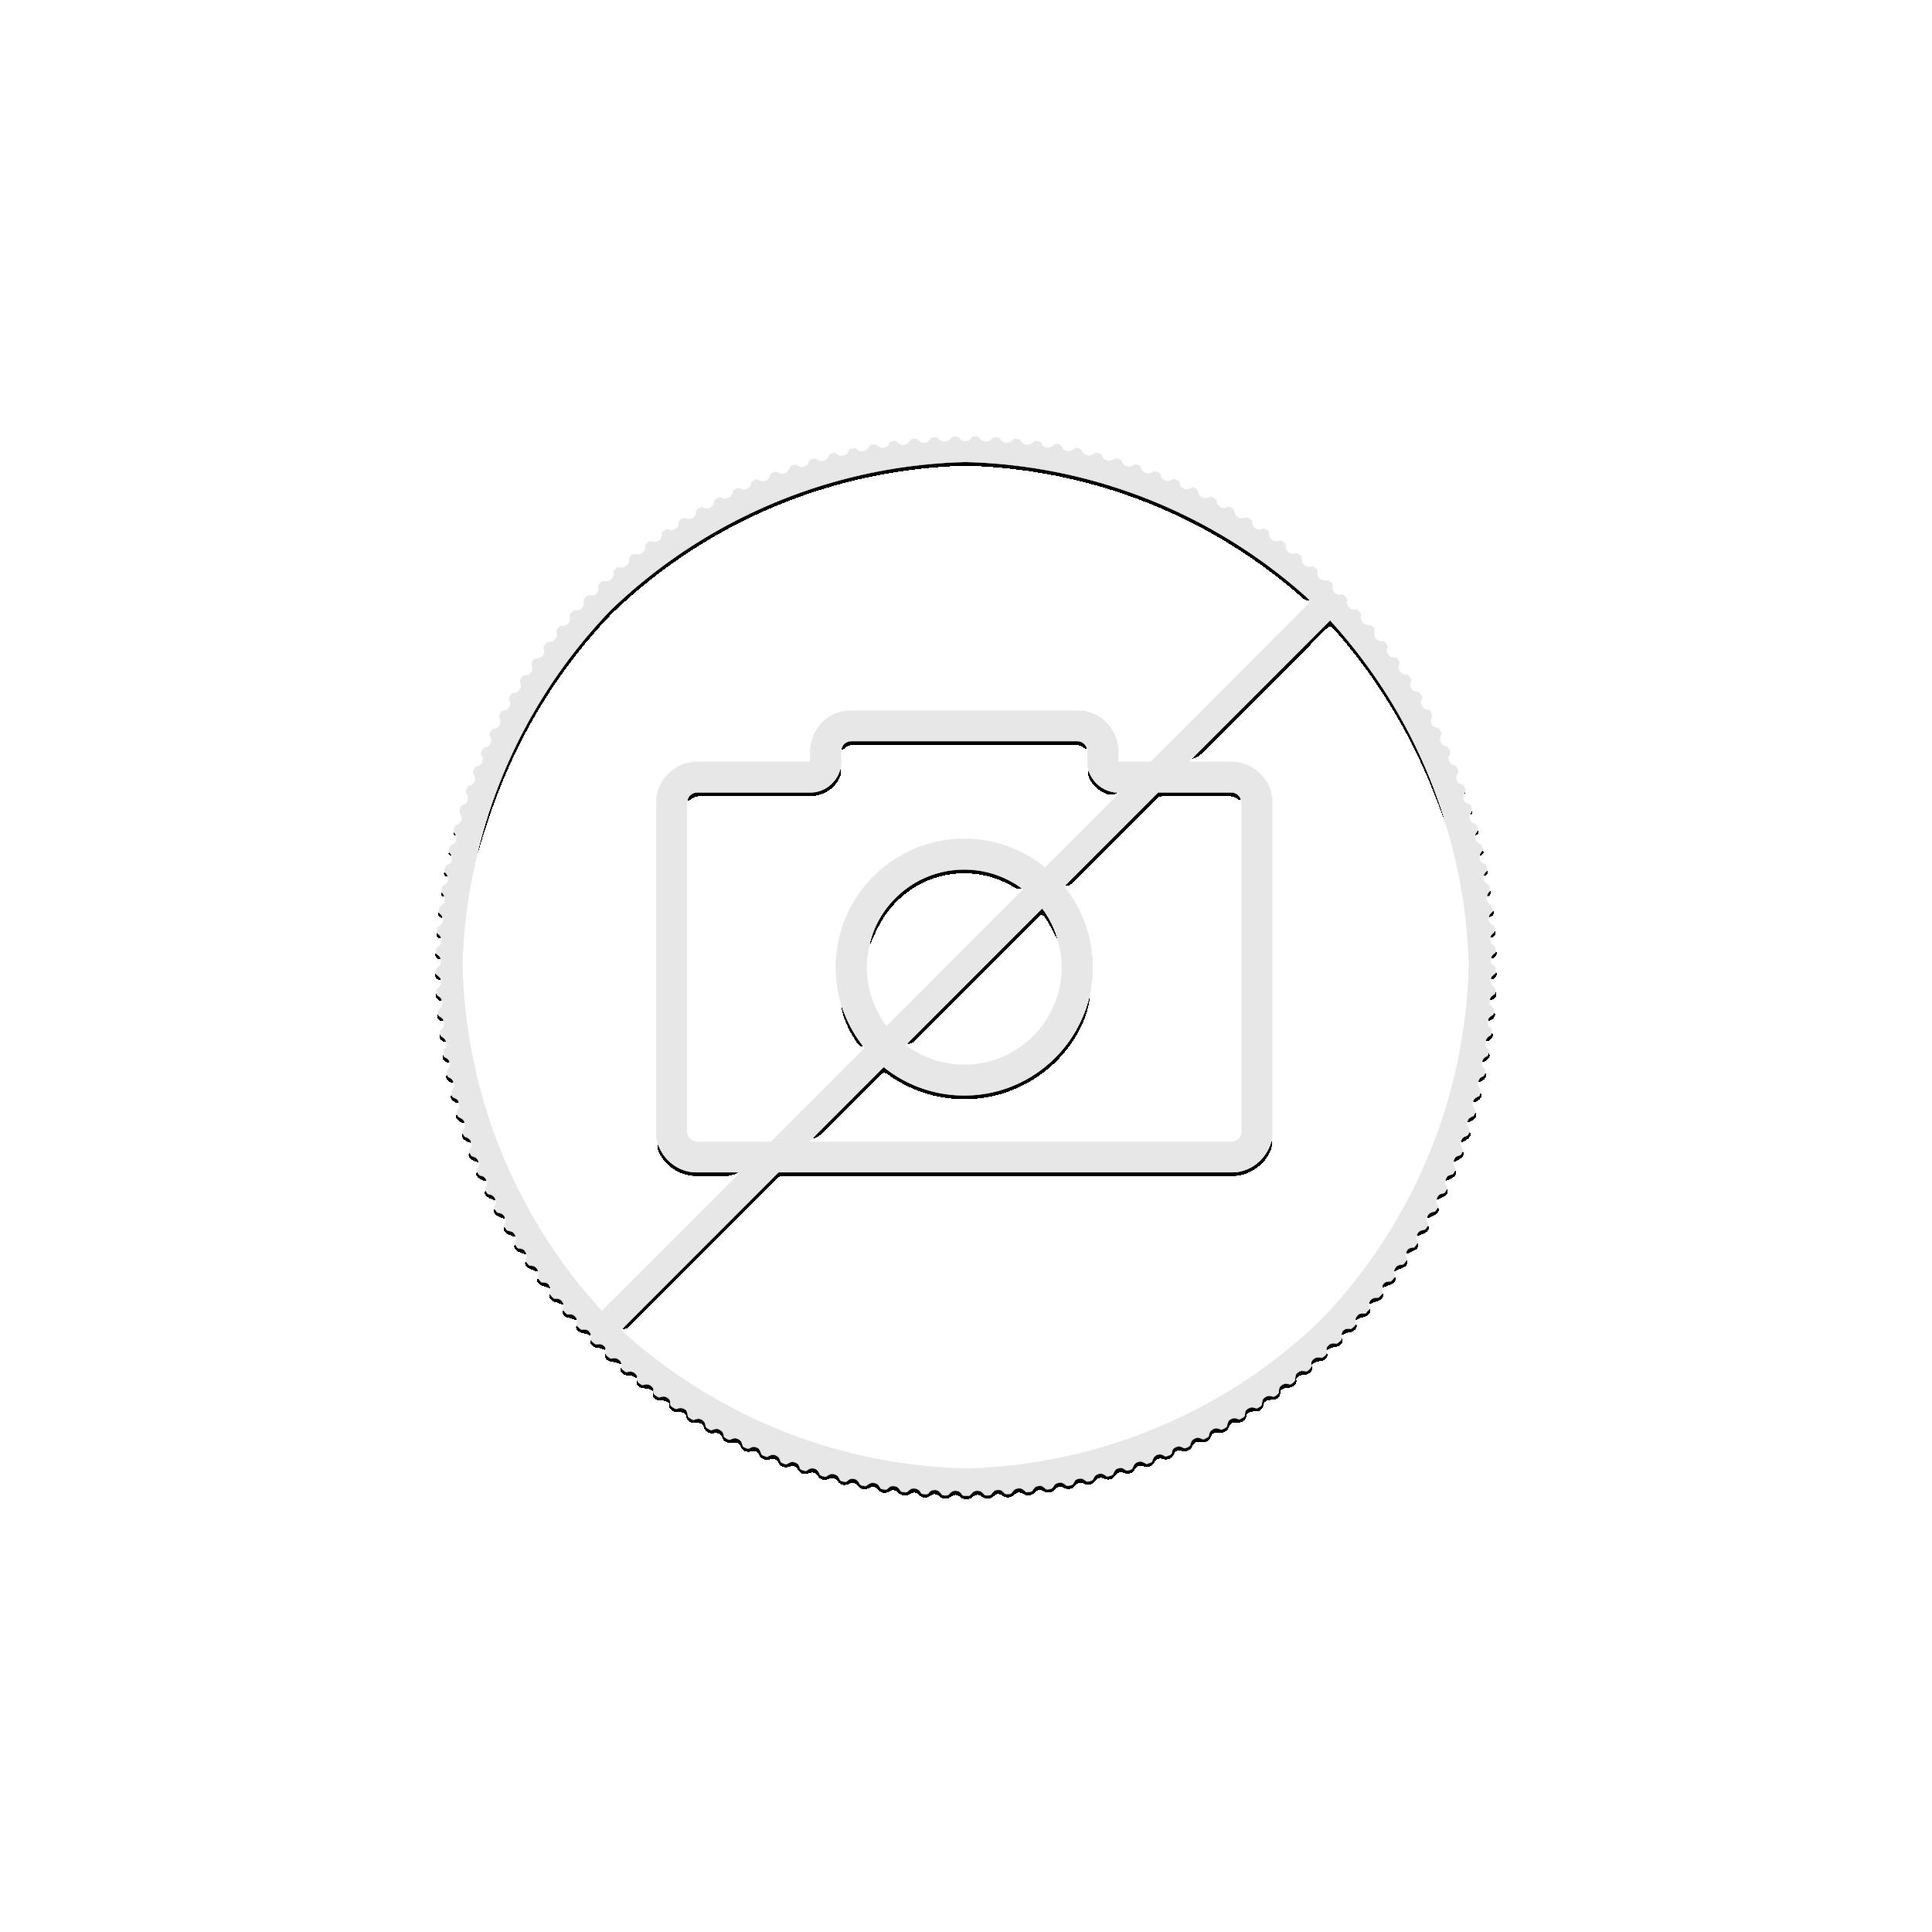 1 Troy ounce zilveren munt Lunar 2022 Proof